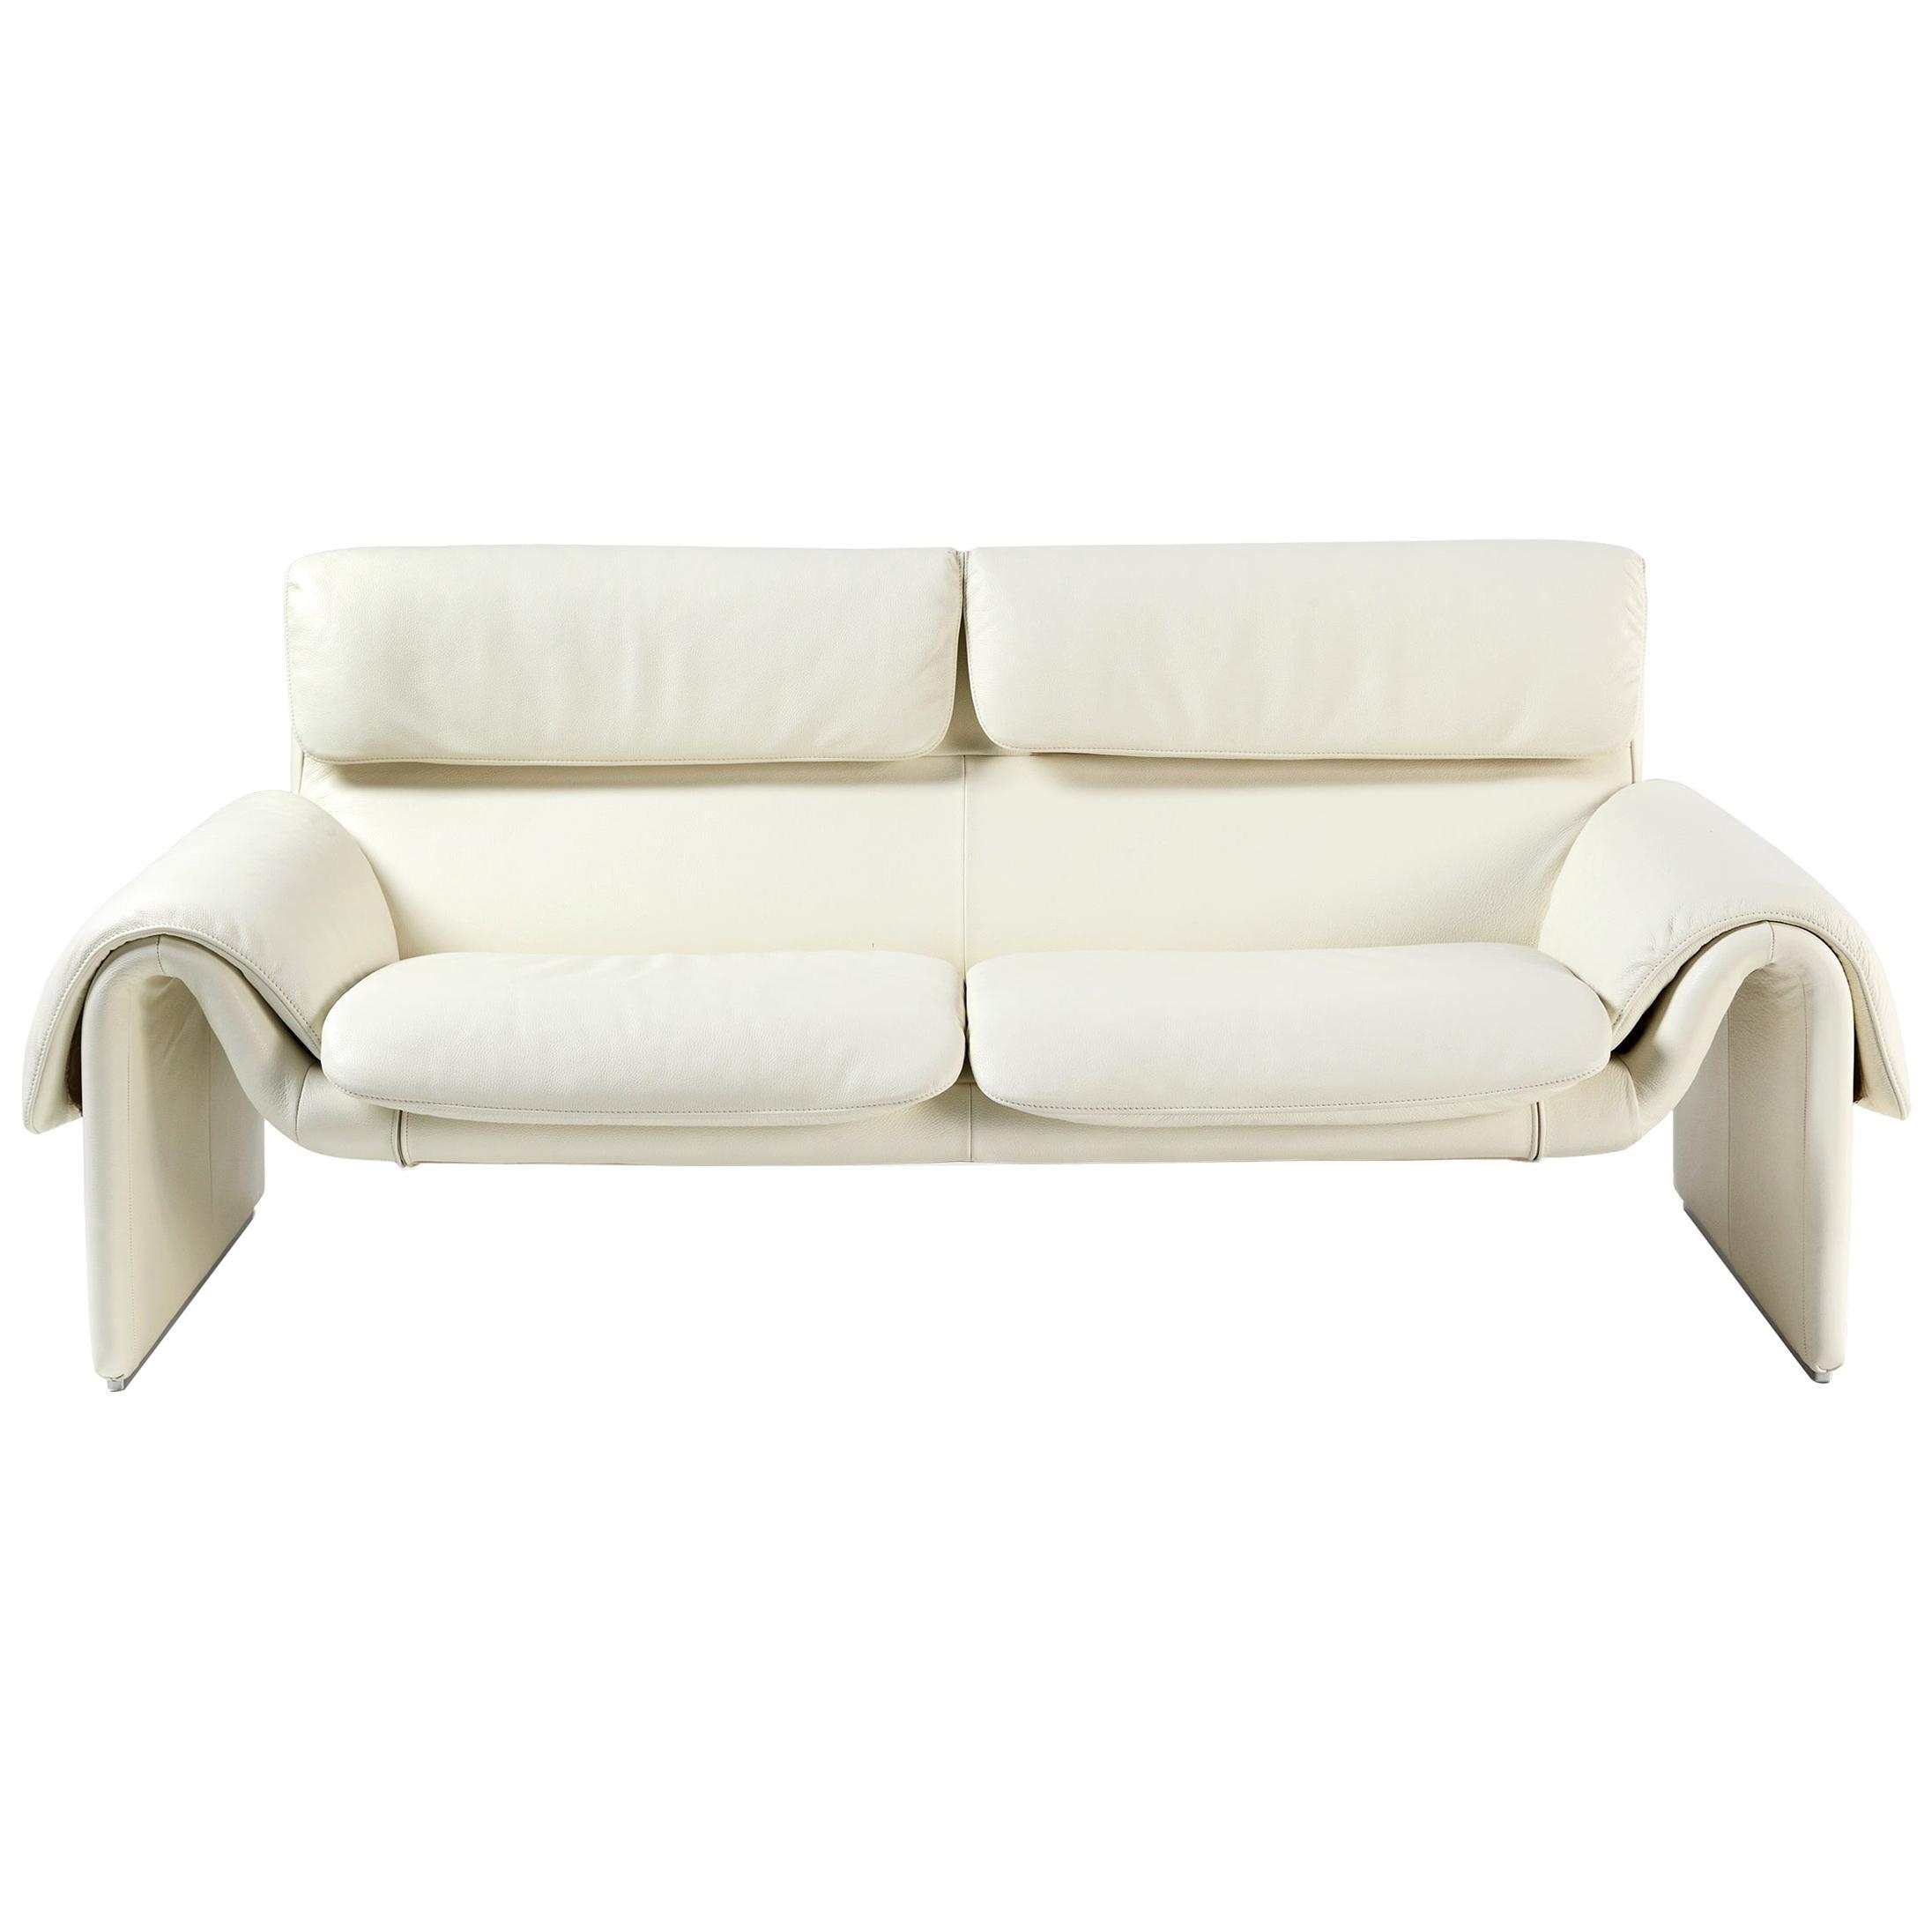 DS-2011 Sofa by De Sede